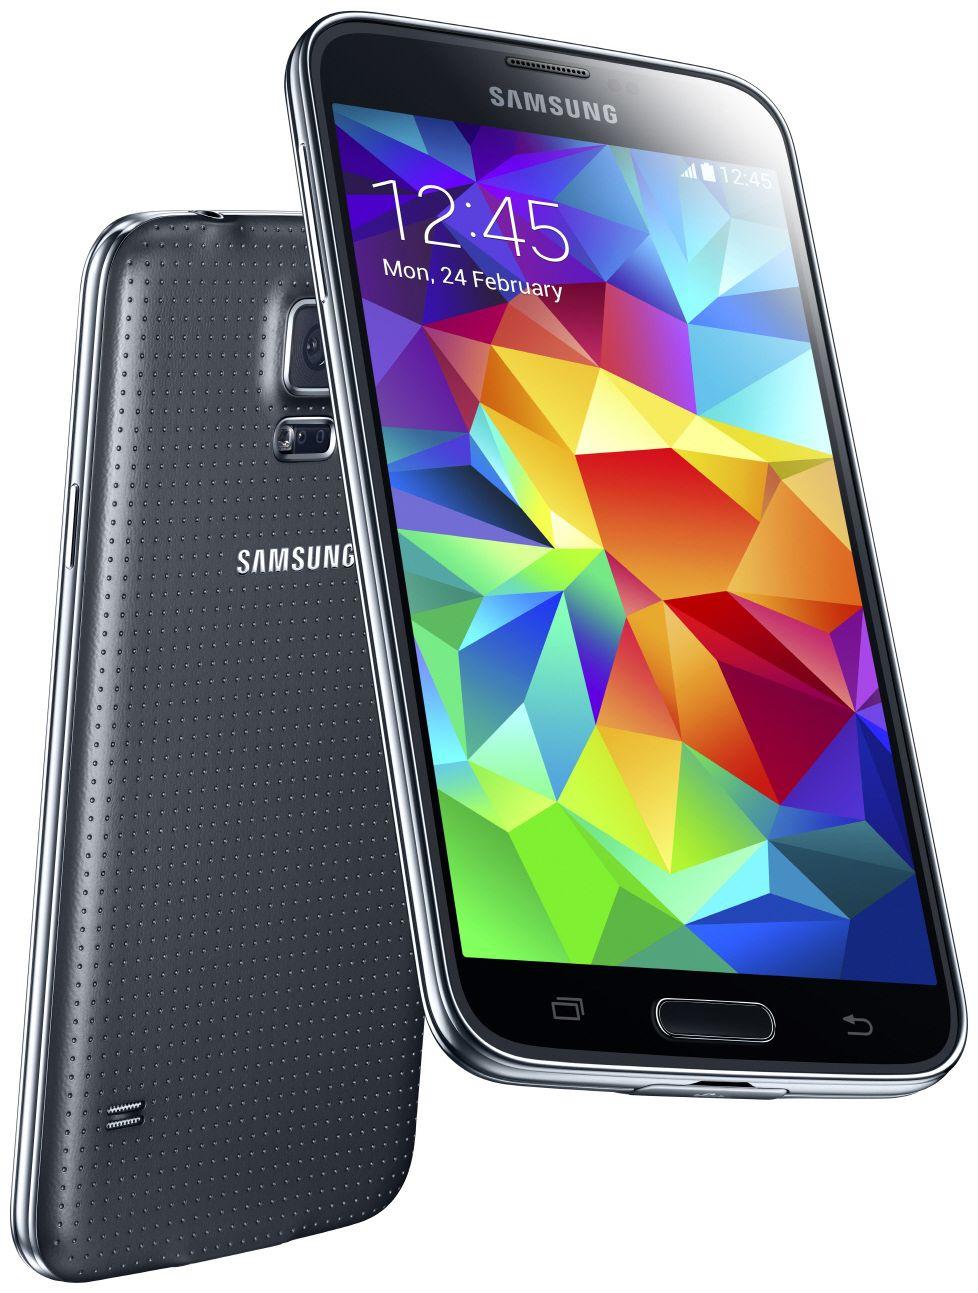 1b275e0ca6a626 Samsung Galaxy S5 16 Go Noir pas cher - Rakuten